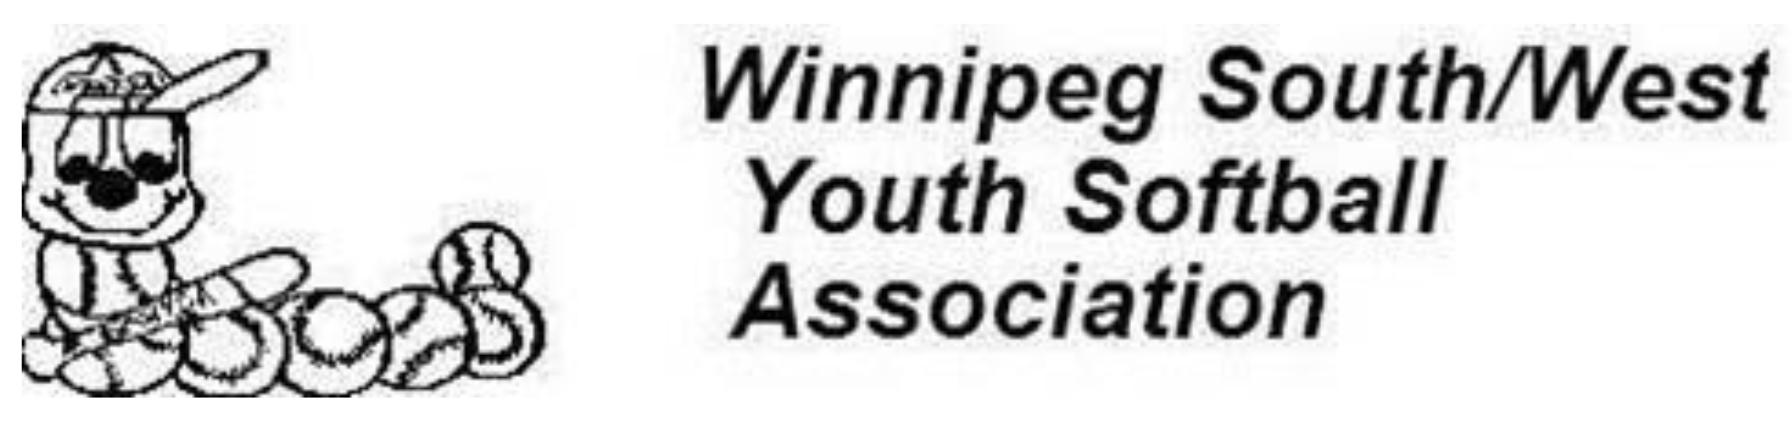 Winnipeg South/West Youth Softball Association